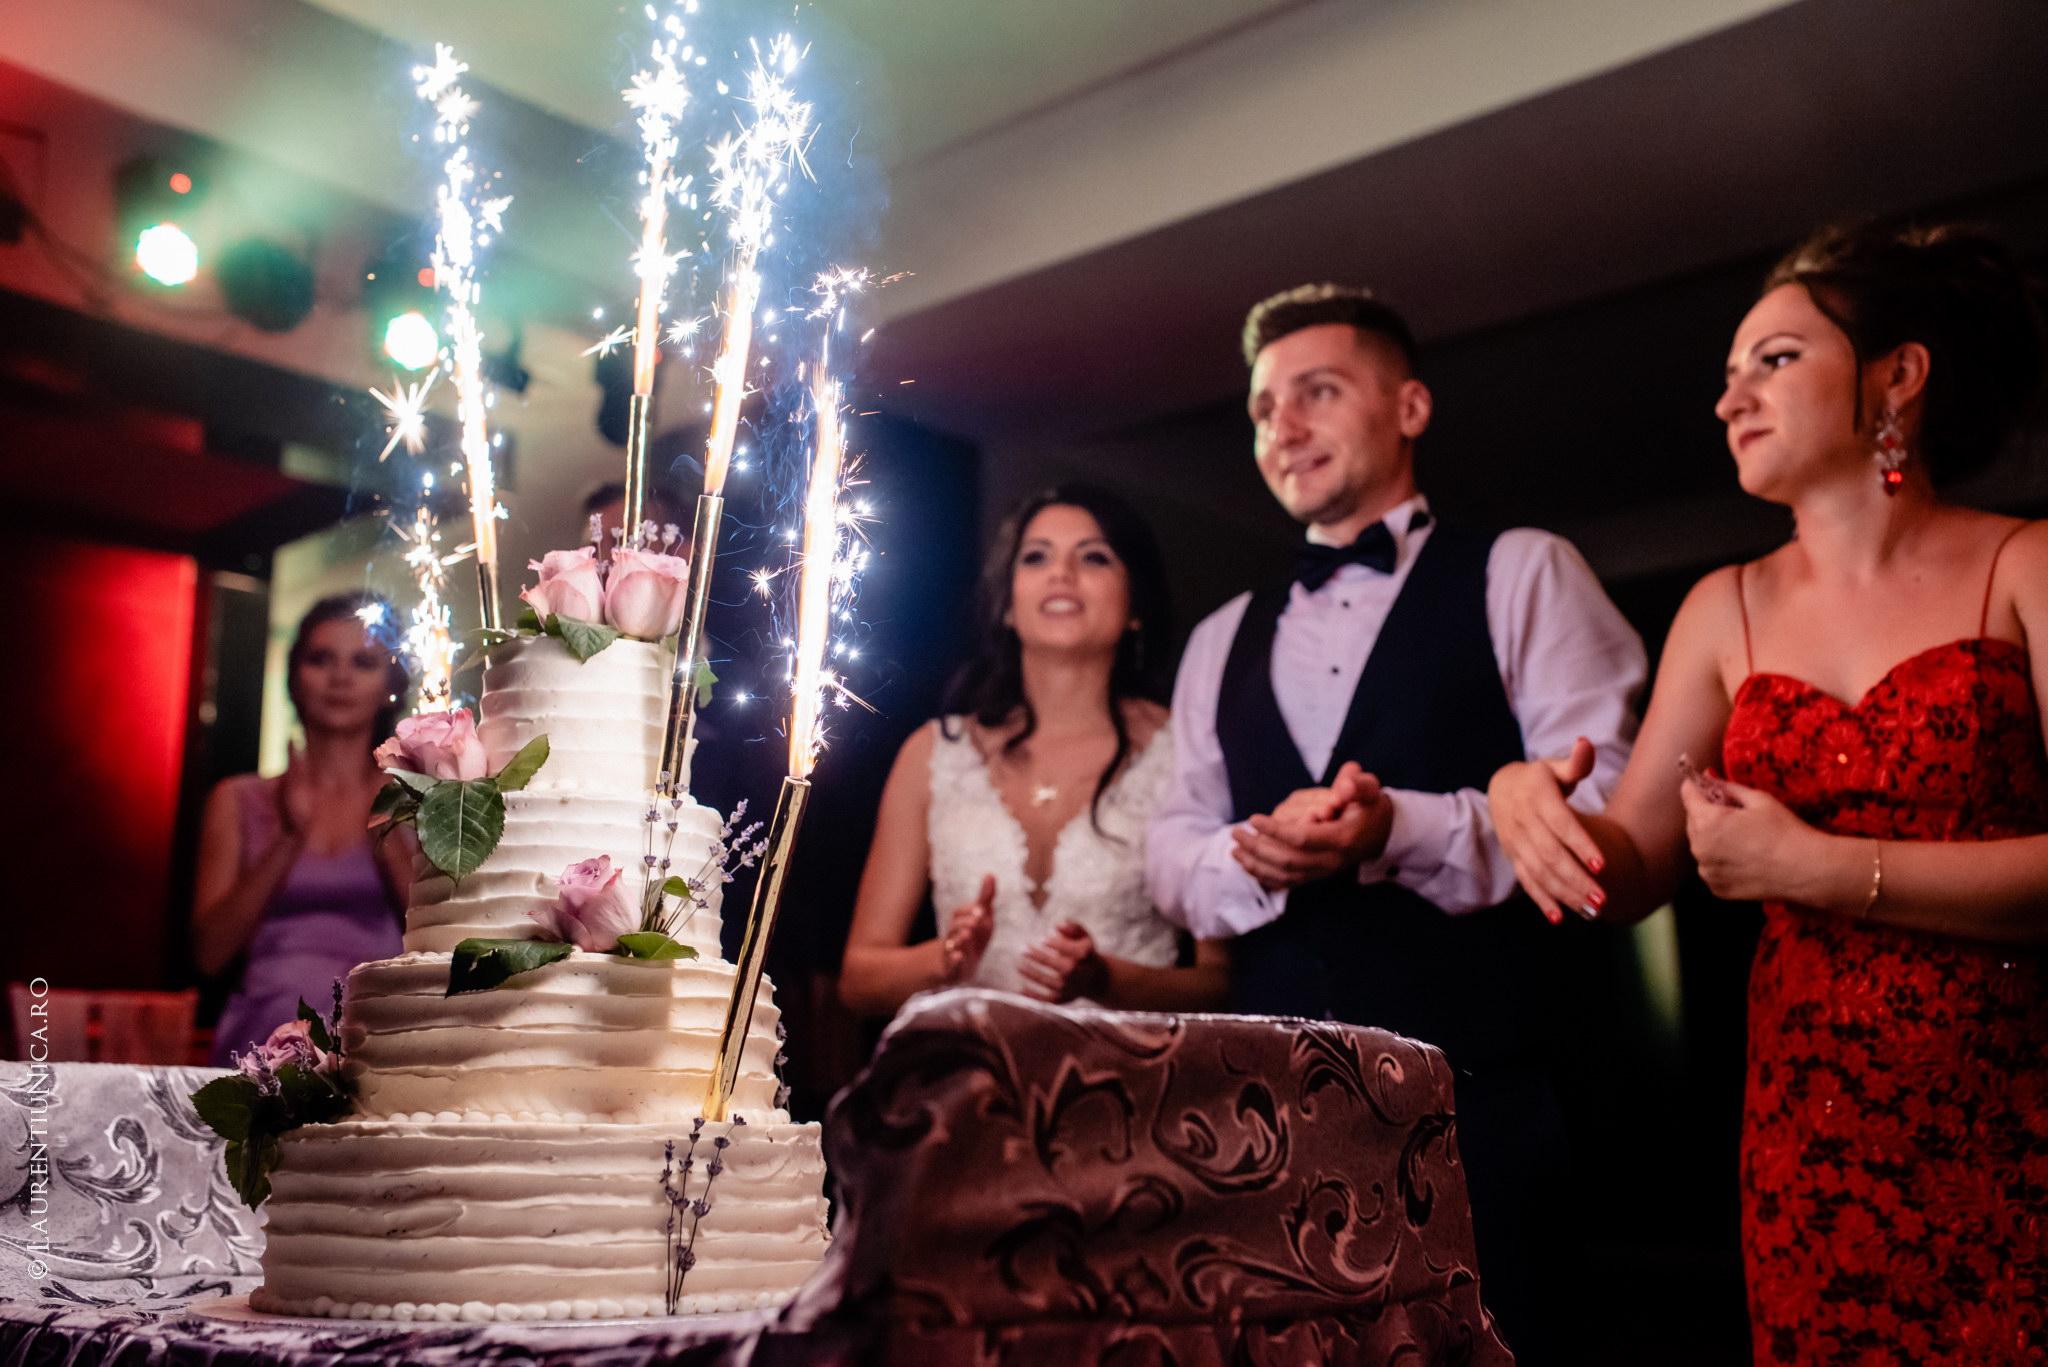 fotografii nunta craiova bia alex fotograf nunta laurentiu nica 45 - Bia & Alex | Fotografii nunta | Craiova